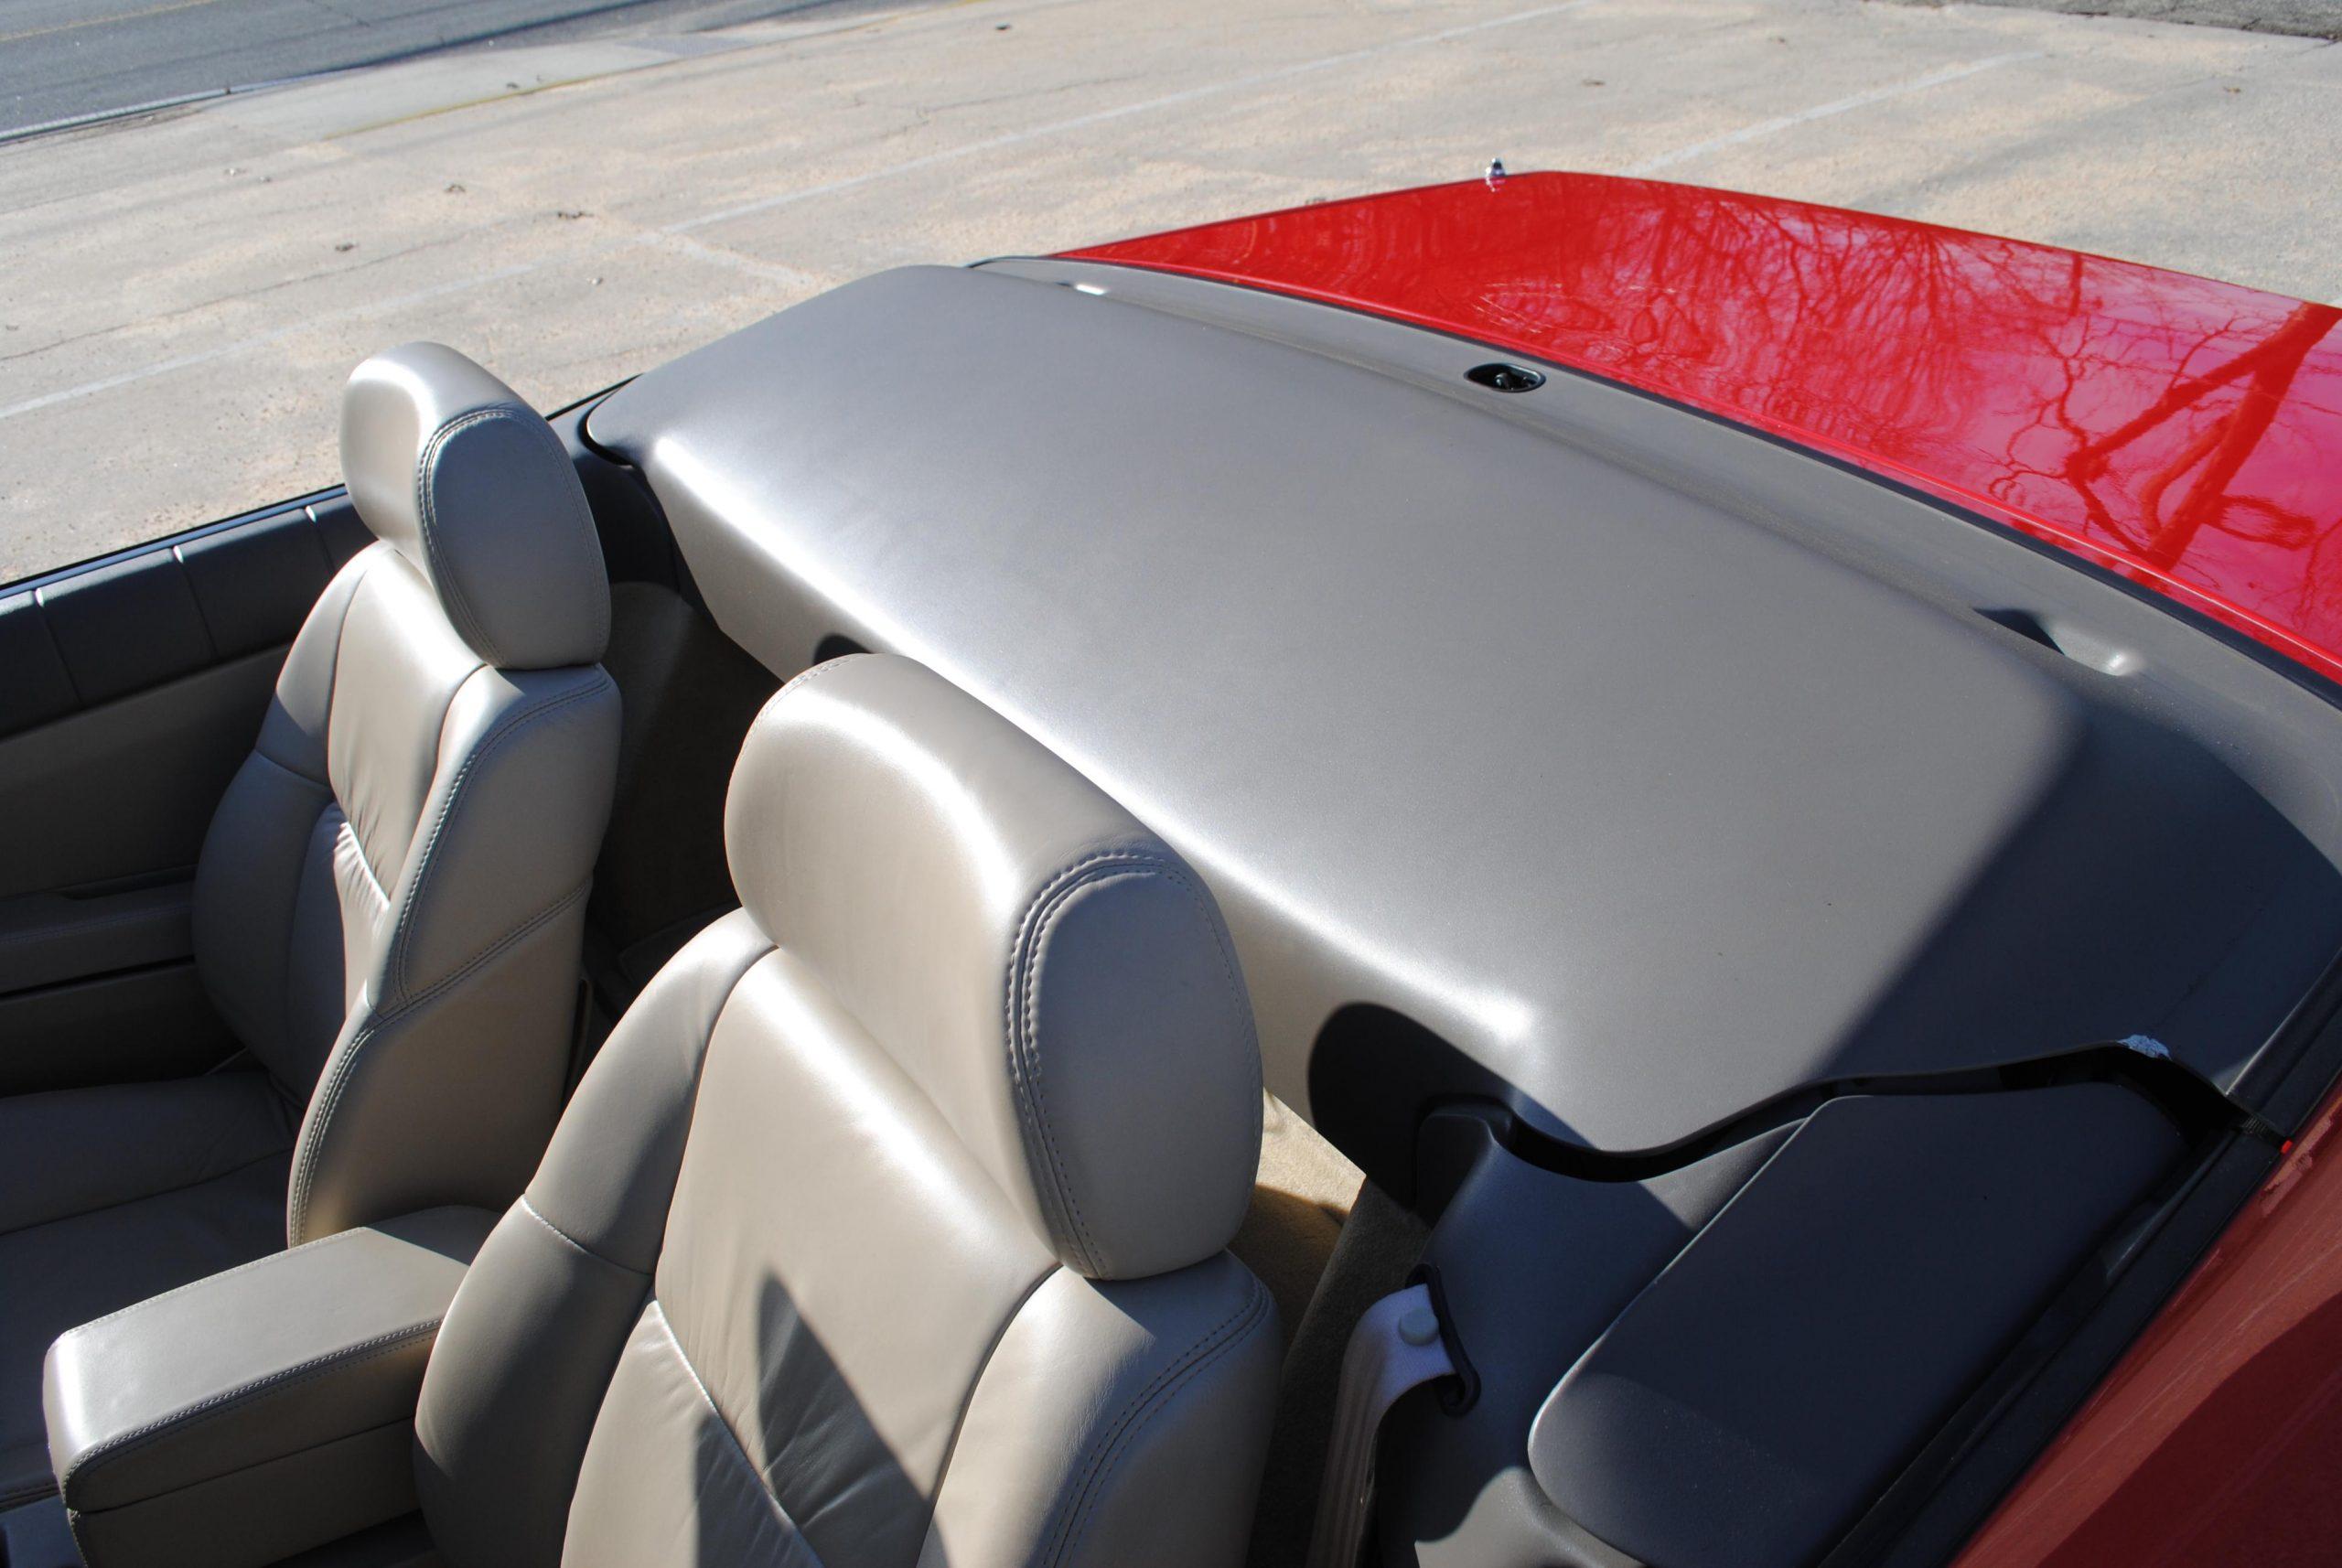 1993 Cadillac Allante rear top cover